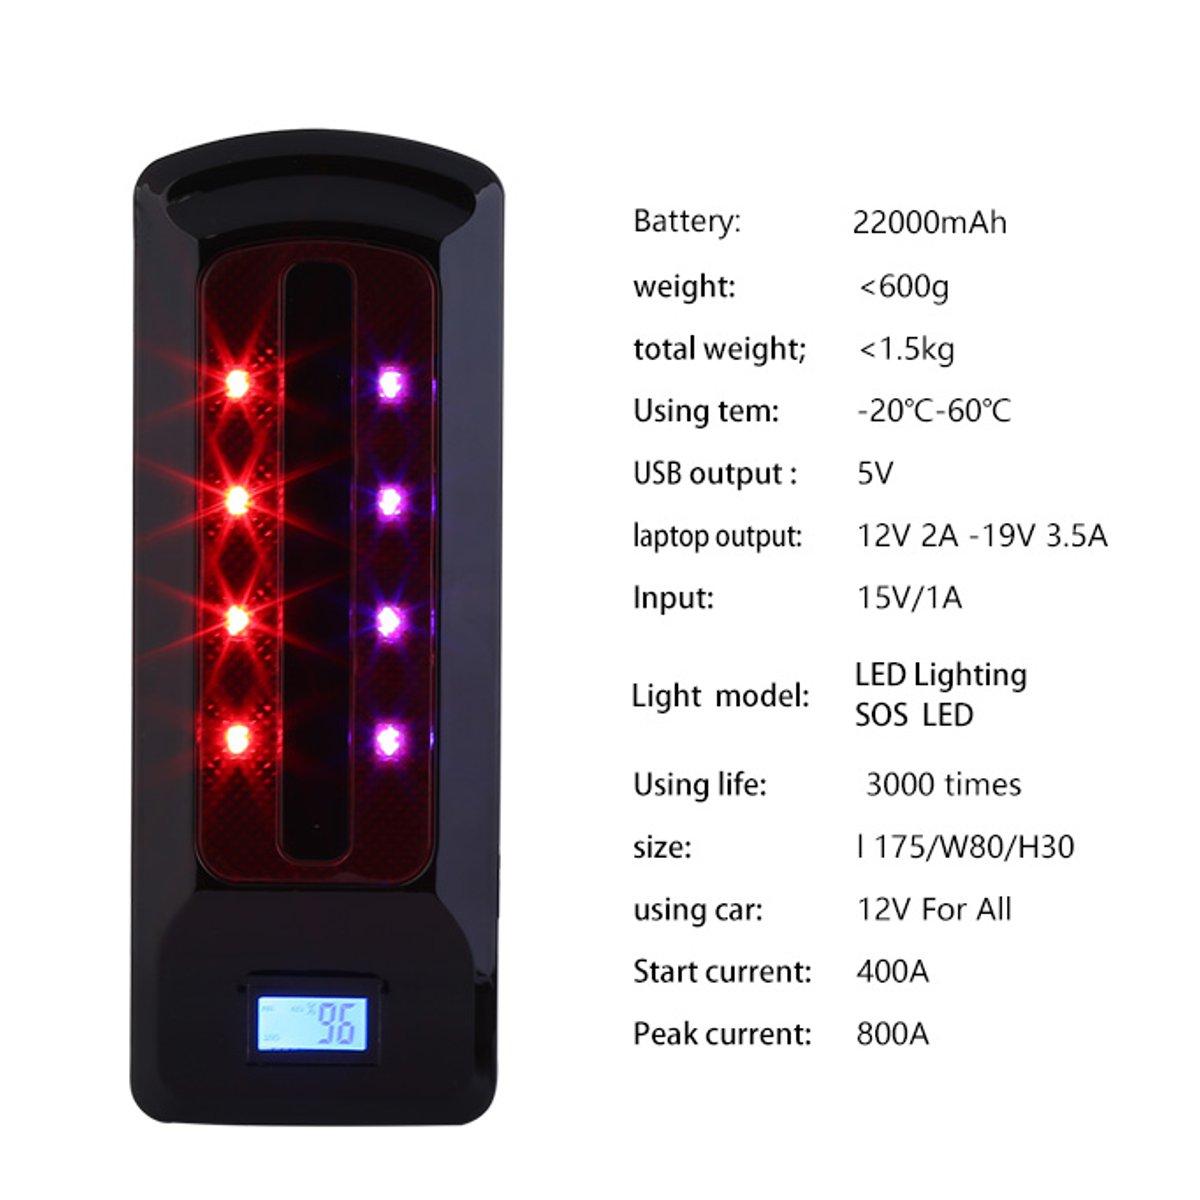 12V 99800mAh Car Jump Starter LED Battery Charger Booster Emergency Power Bank